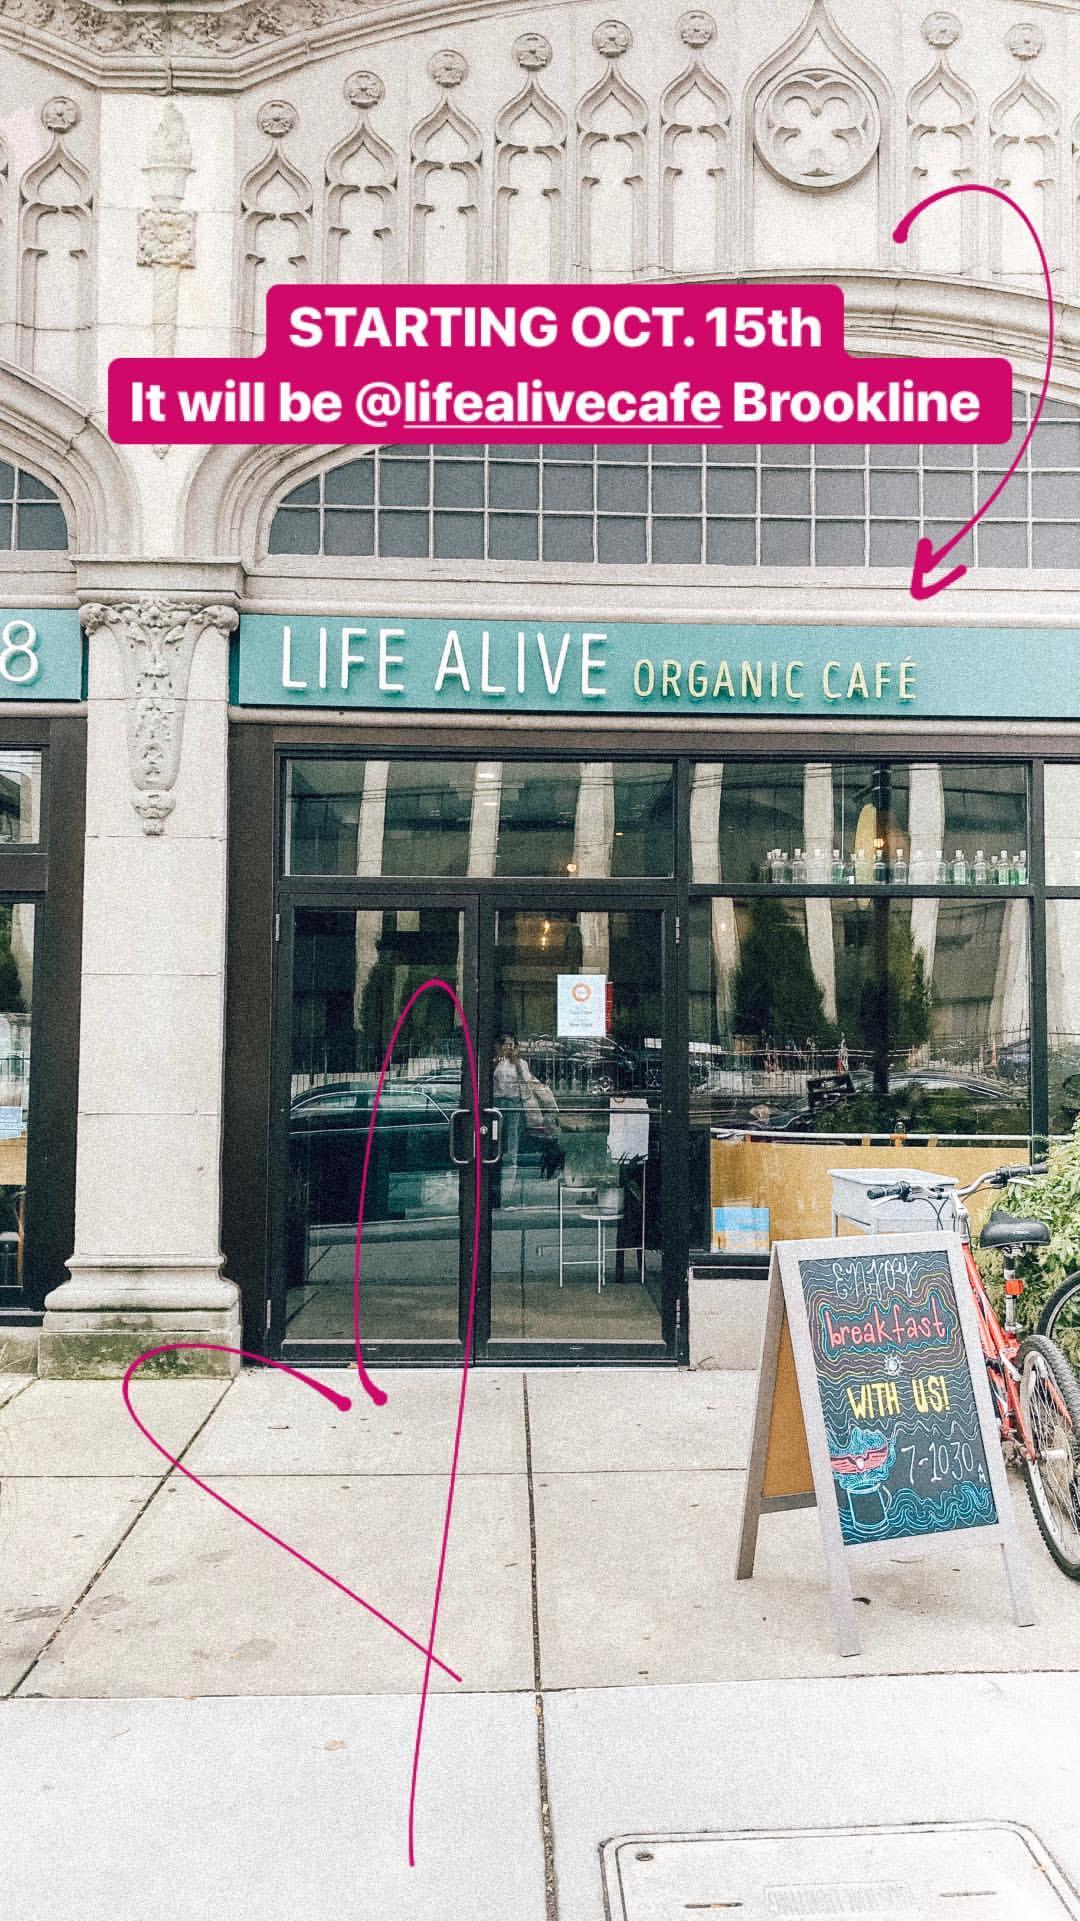 2018.10.09_anagoesfit, Instagram Story_Life Alive Brookline03.jpg